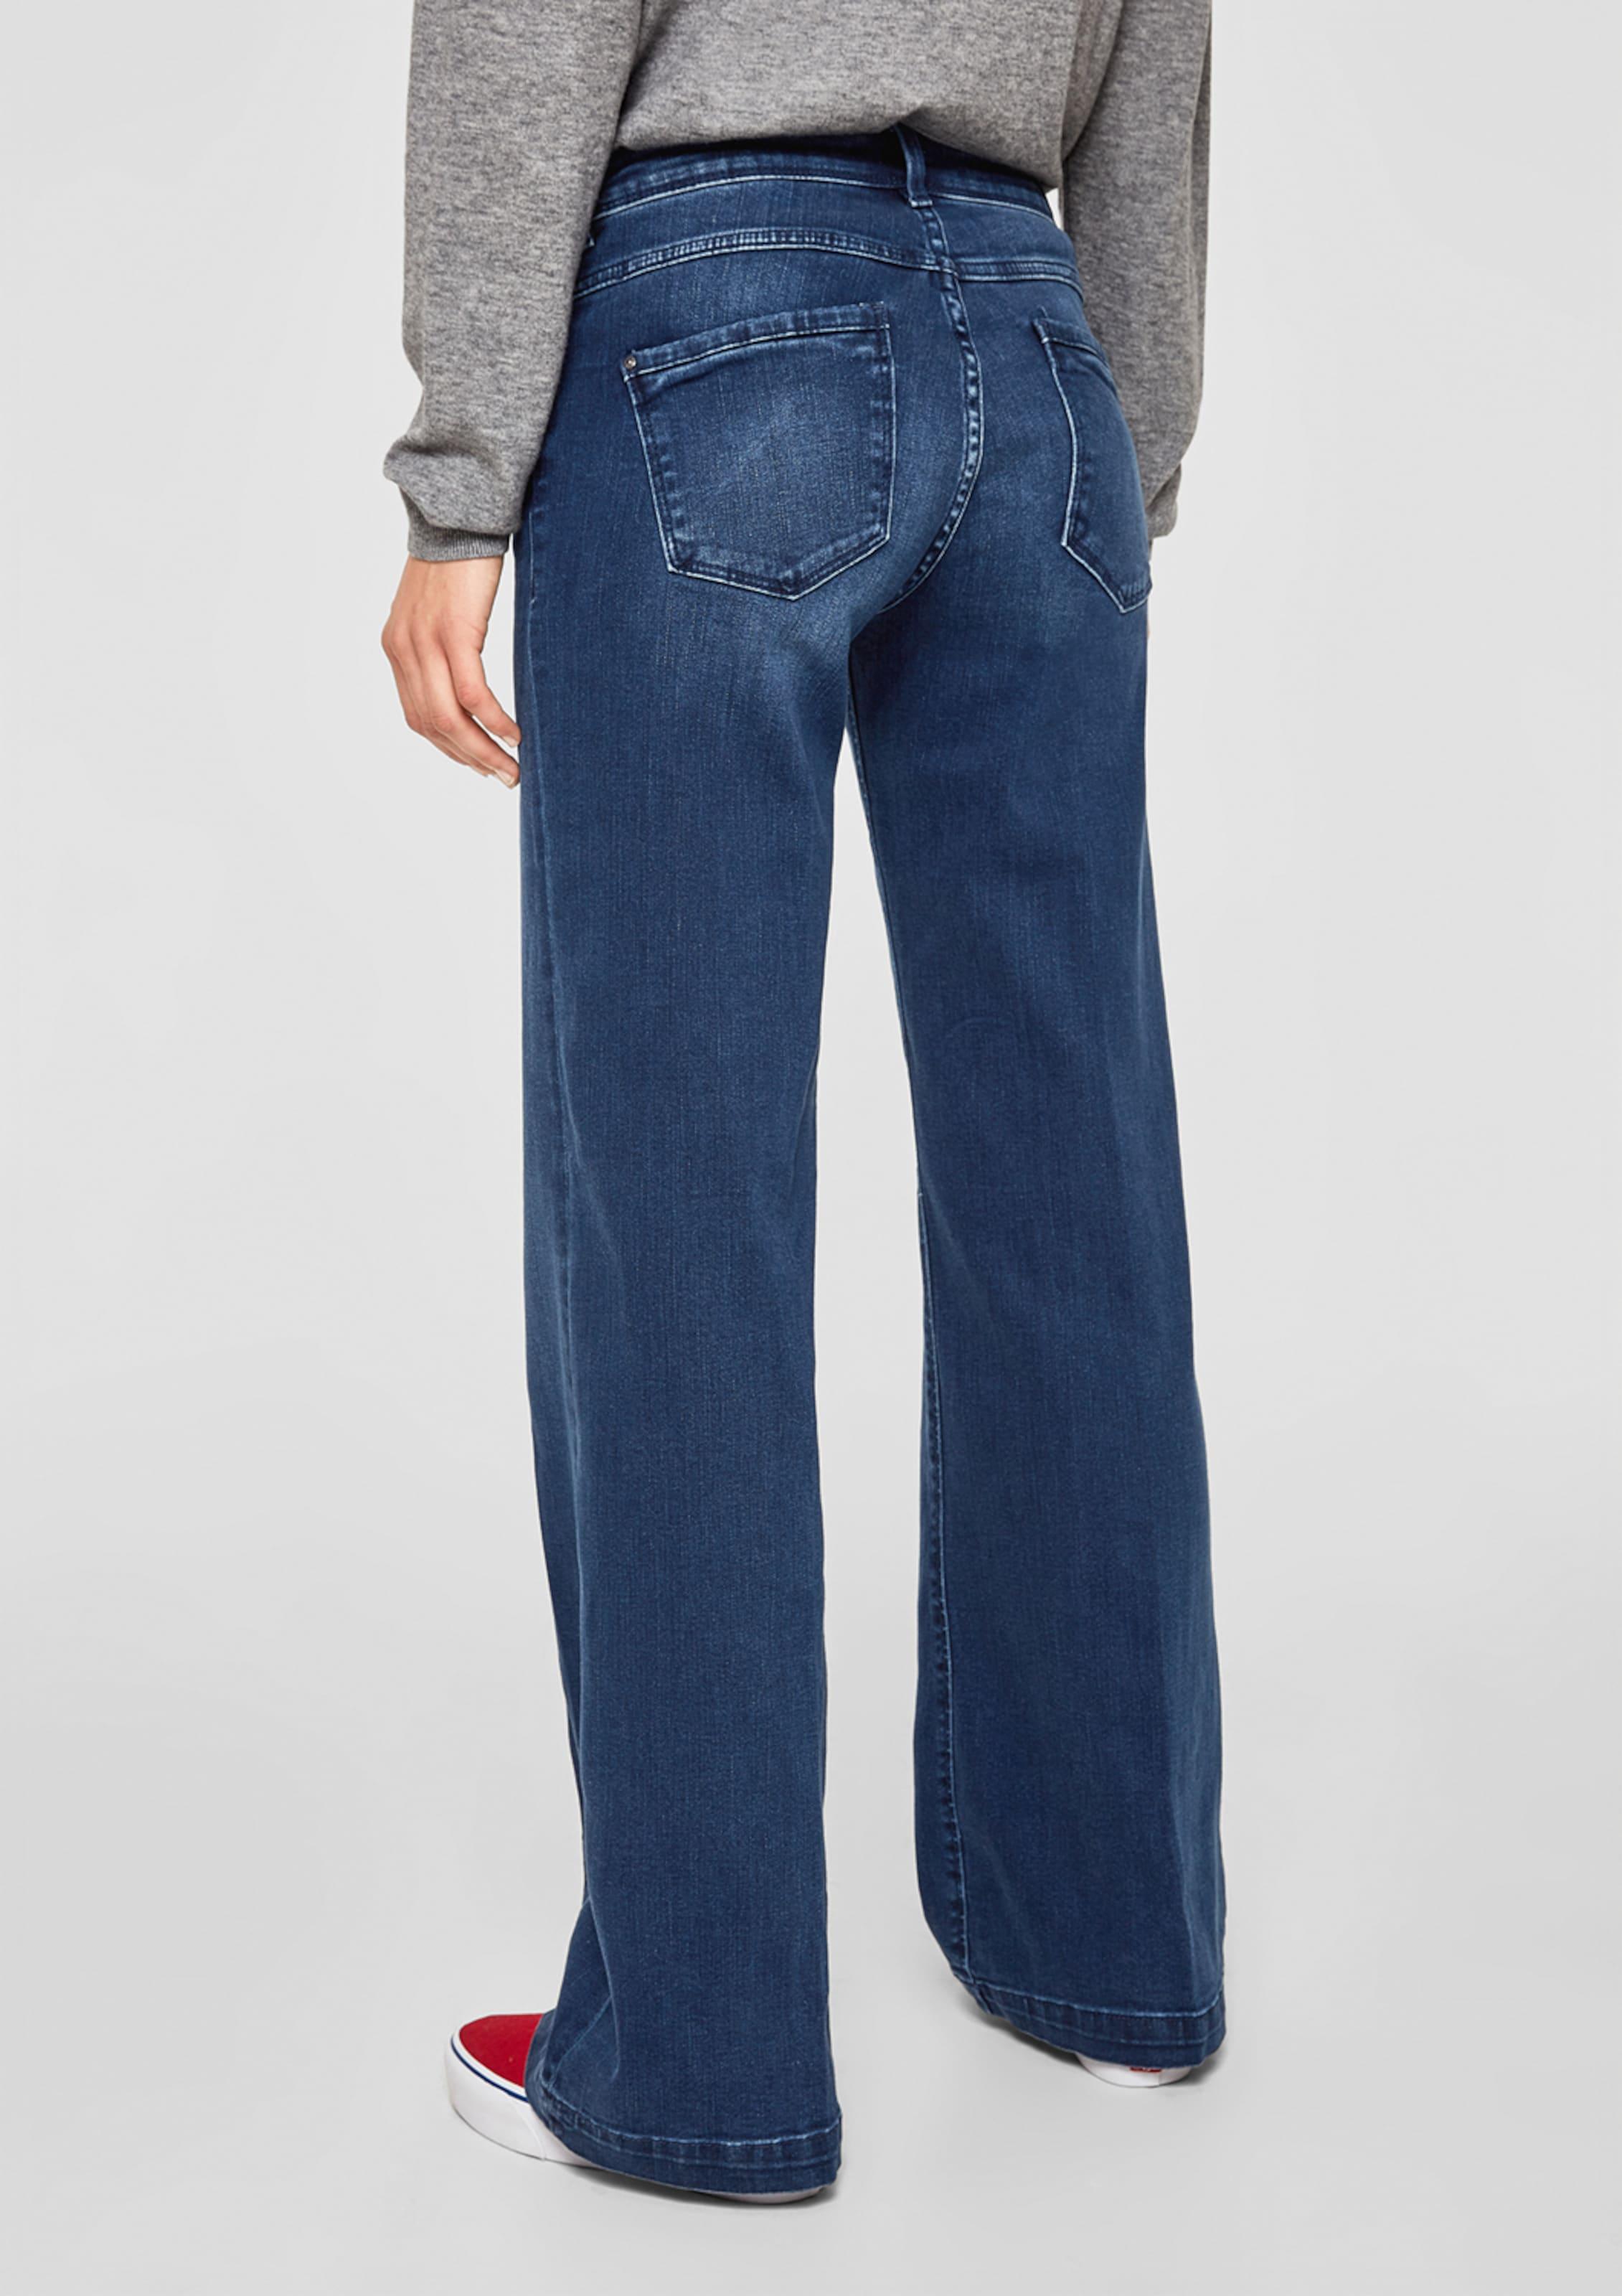 In Denim S Jeans Blue oliver POXiukZ